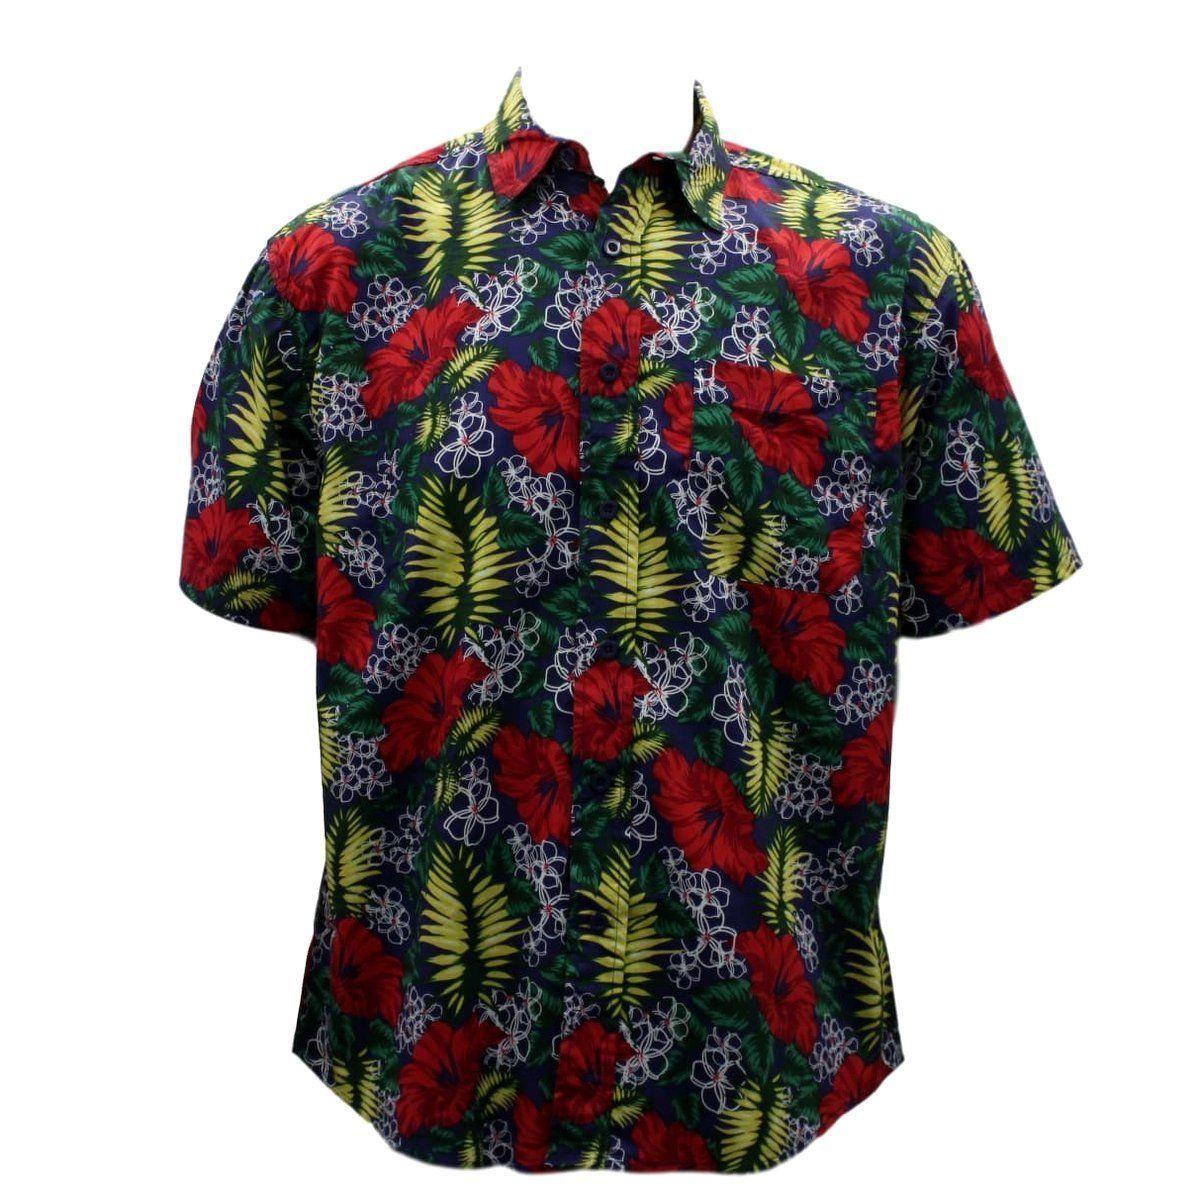 thumbnail 47 - NEW Men's Short Sleeve 100% Cotton Shirt Tropical Hawaiian Summer Style S-6XL